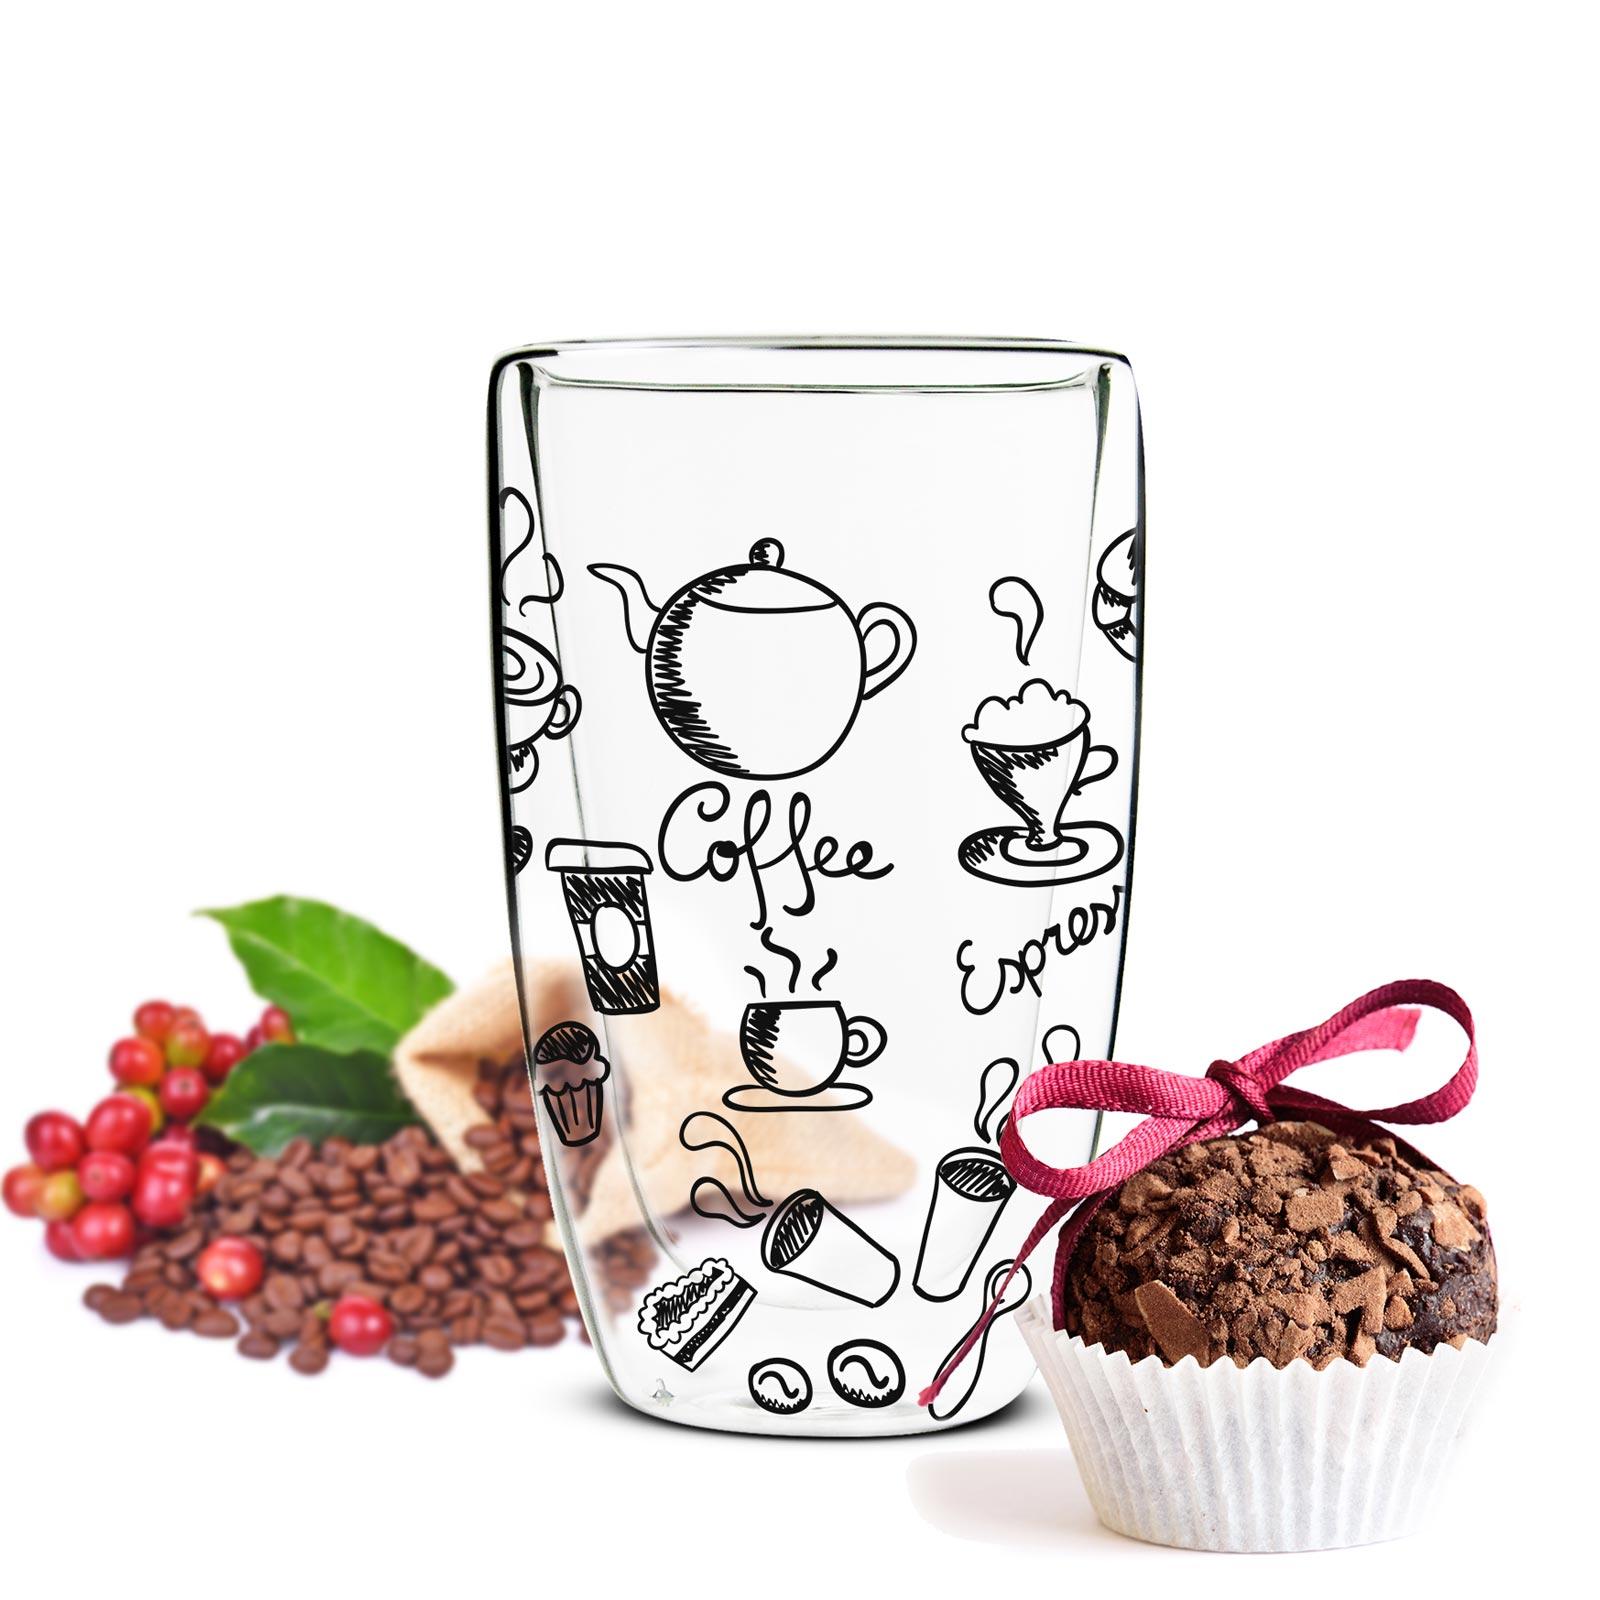 2 doppelwandige latte macchiato gl ser 450ml 2l ffel kaffeegl ser motiv schwarz ebay. Black Bedroom Furniture Sets. Home Design Ideas